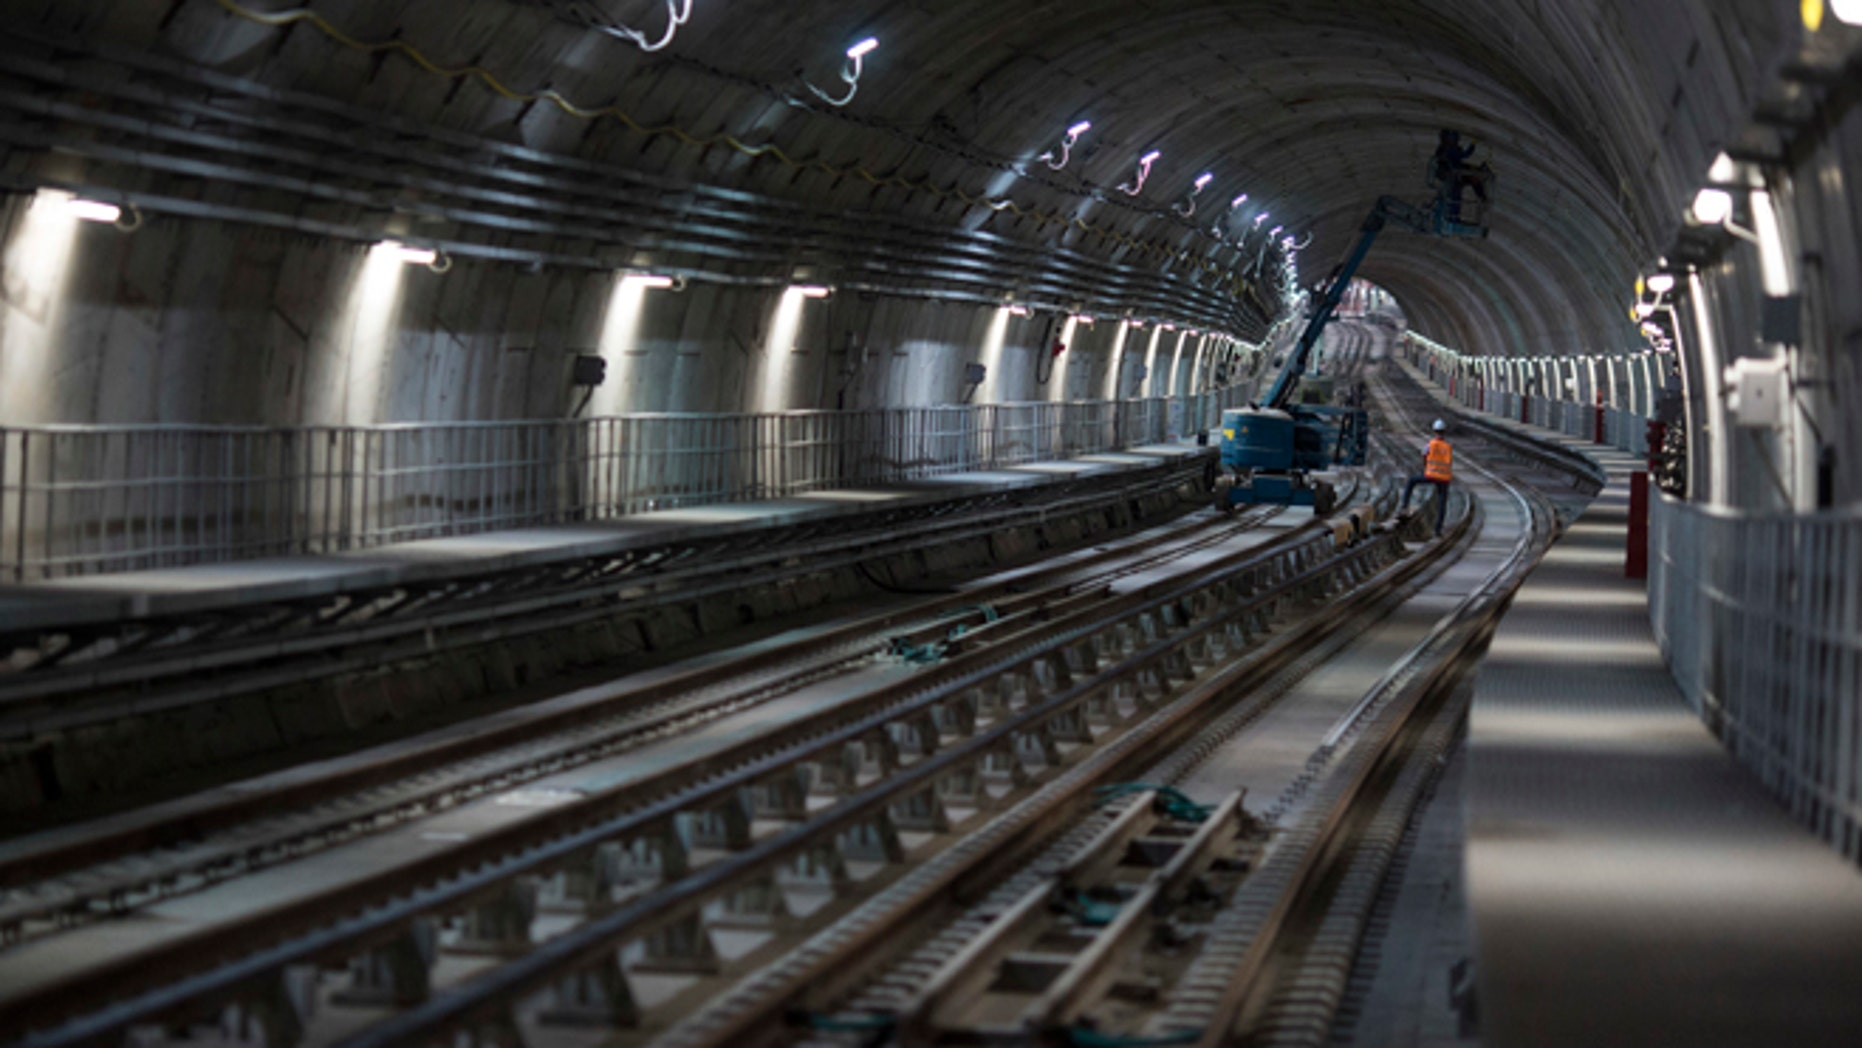 Men work in the new underground subway tunnel below Ipanema neighborhood in Rio de Janeiro, Brazil.